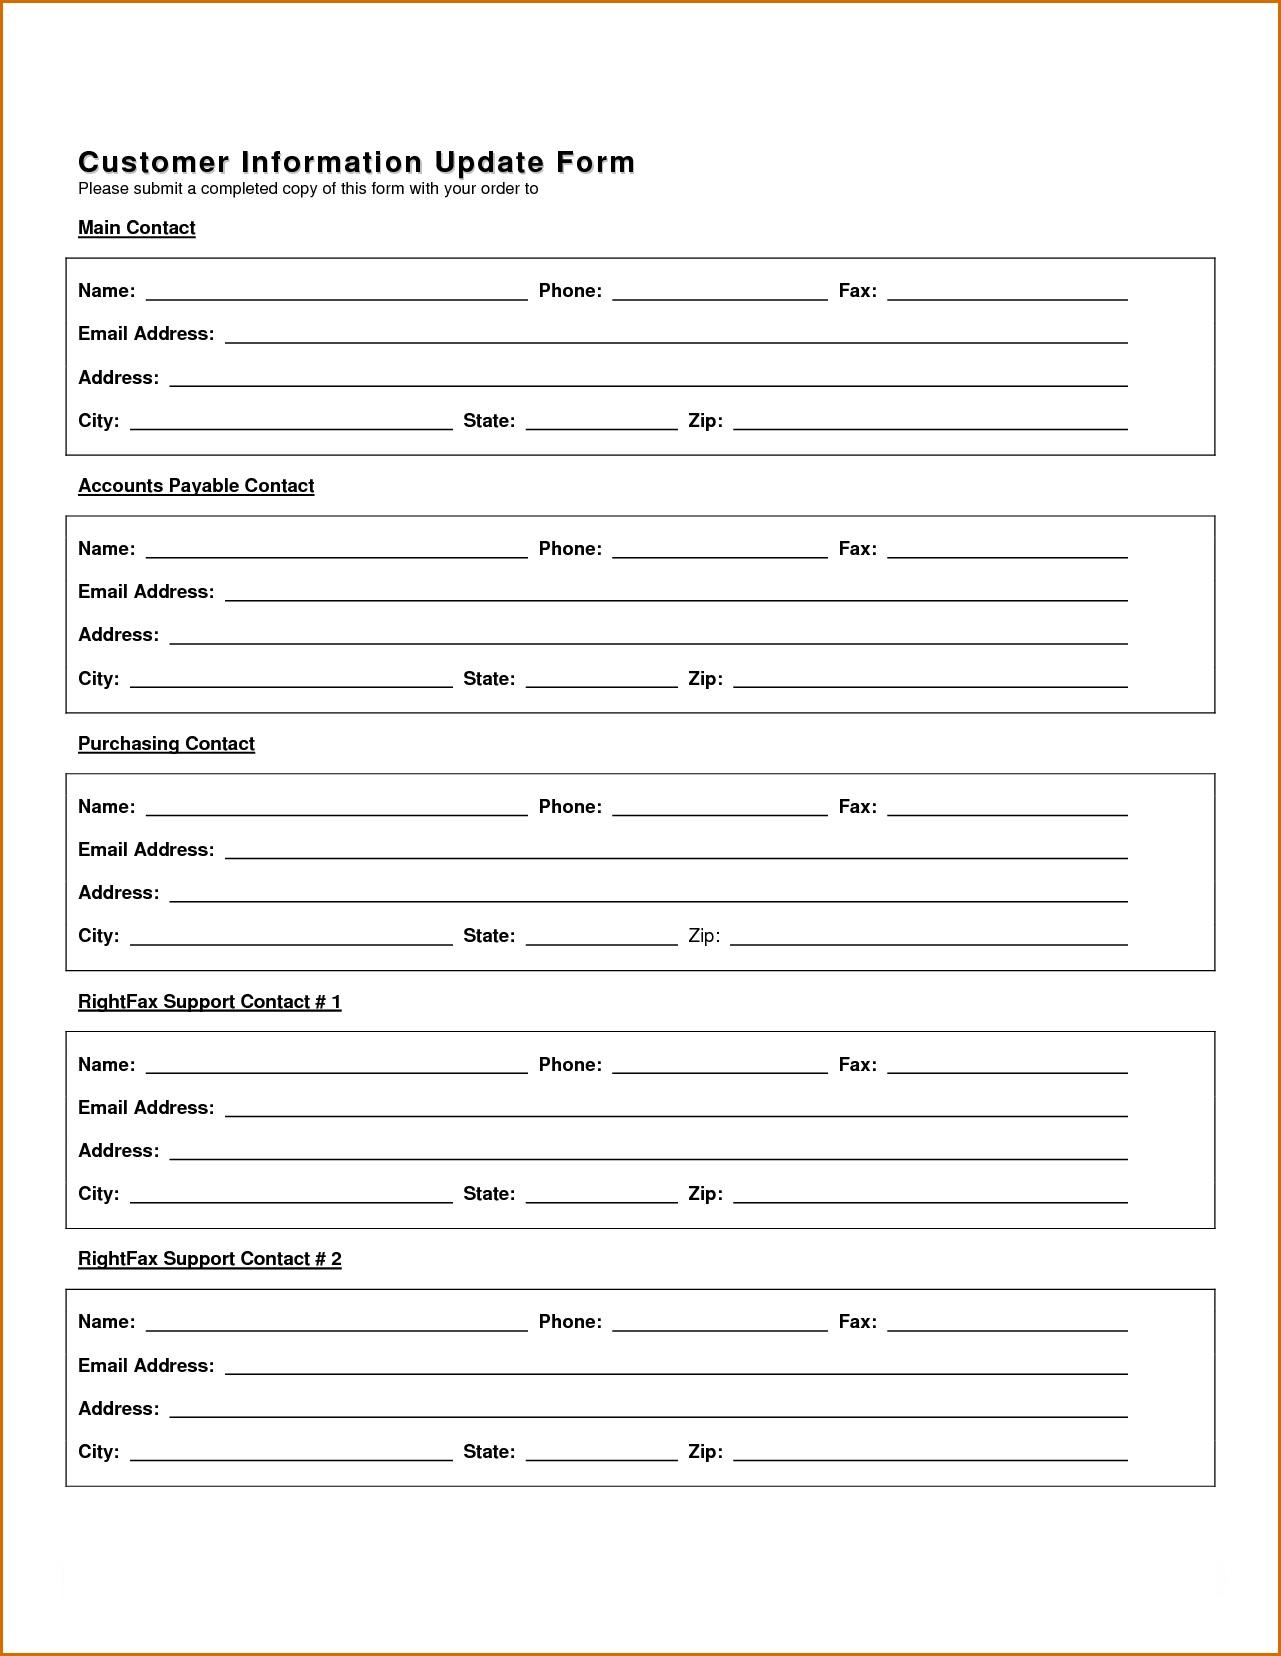 New Customer Information Update Form  Template Uk Account SetupFull